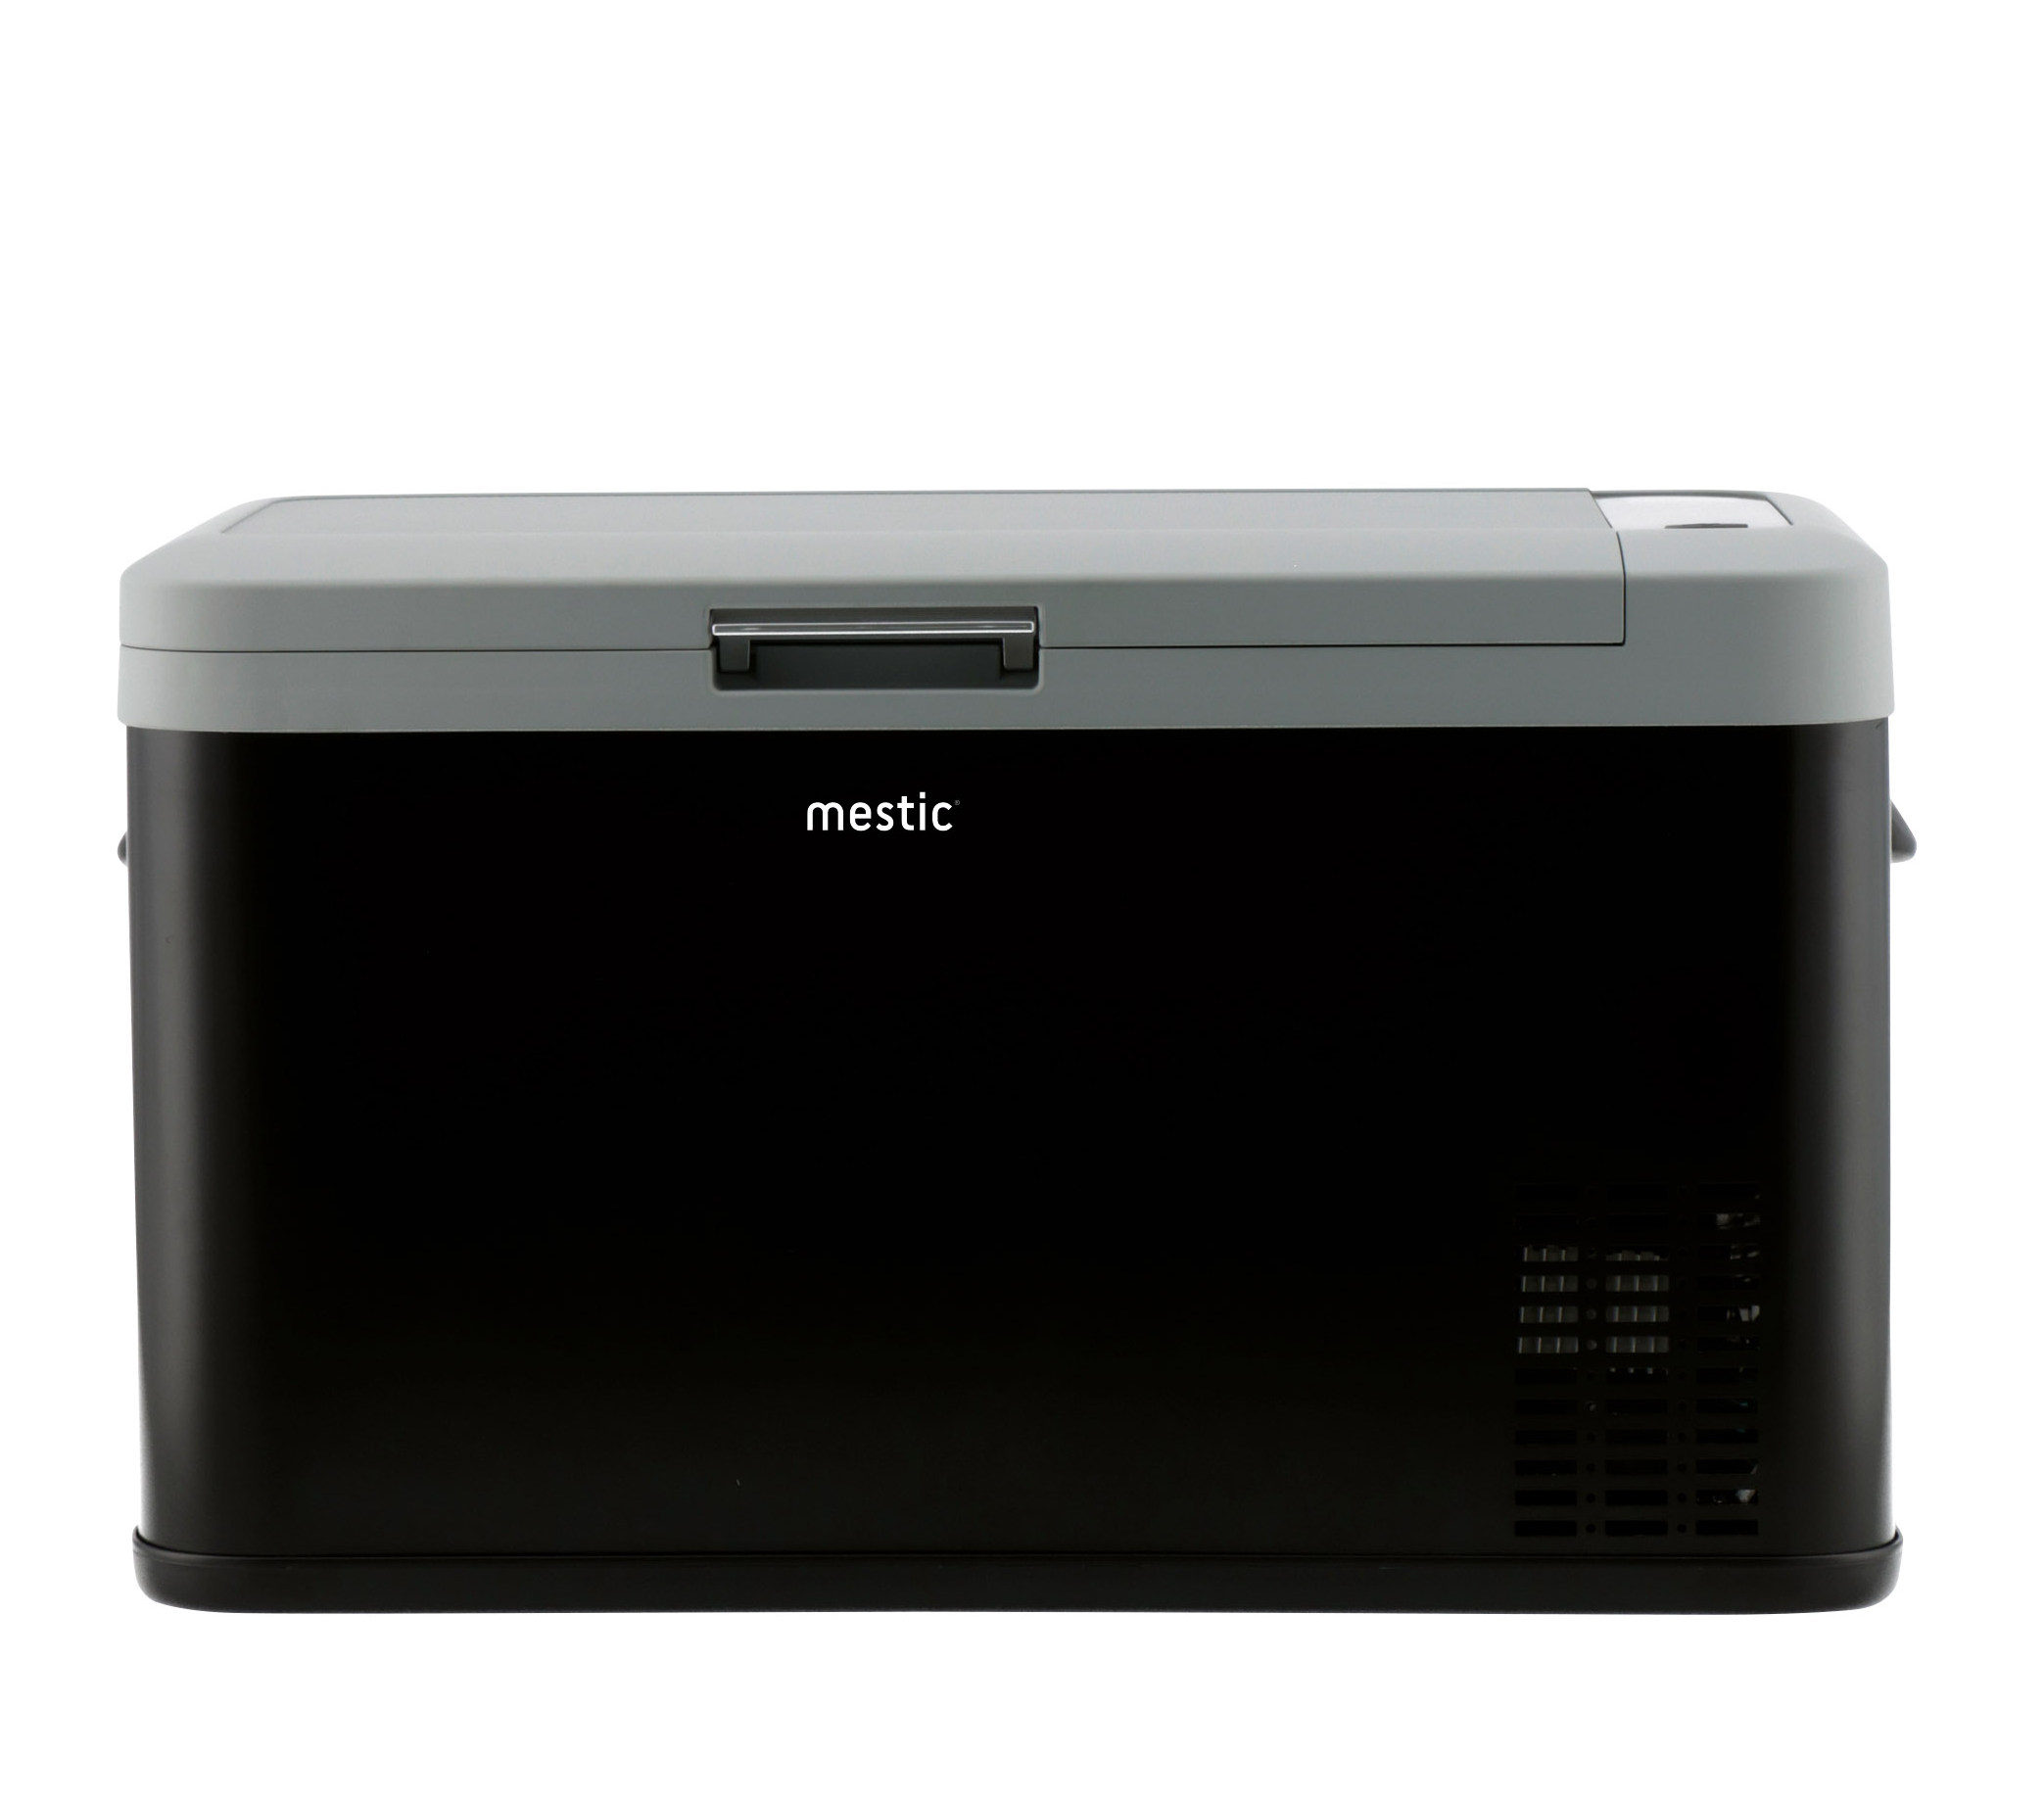 Mestic Portable compression cooler 25 litre